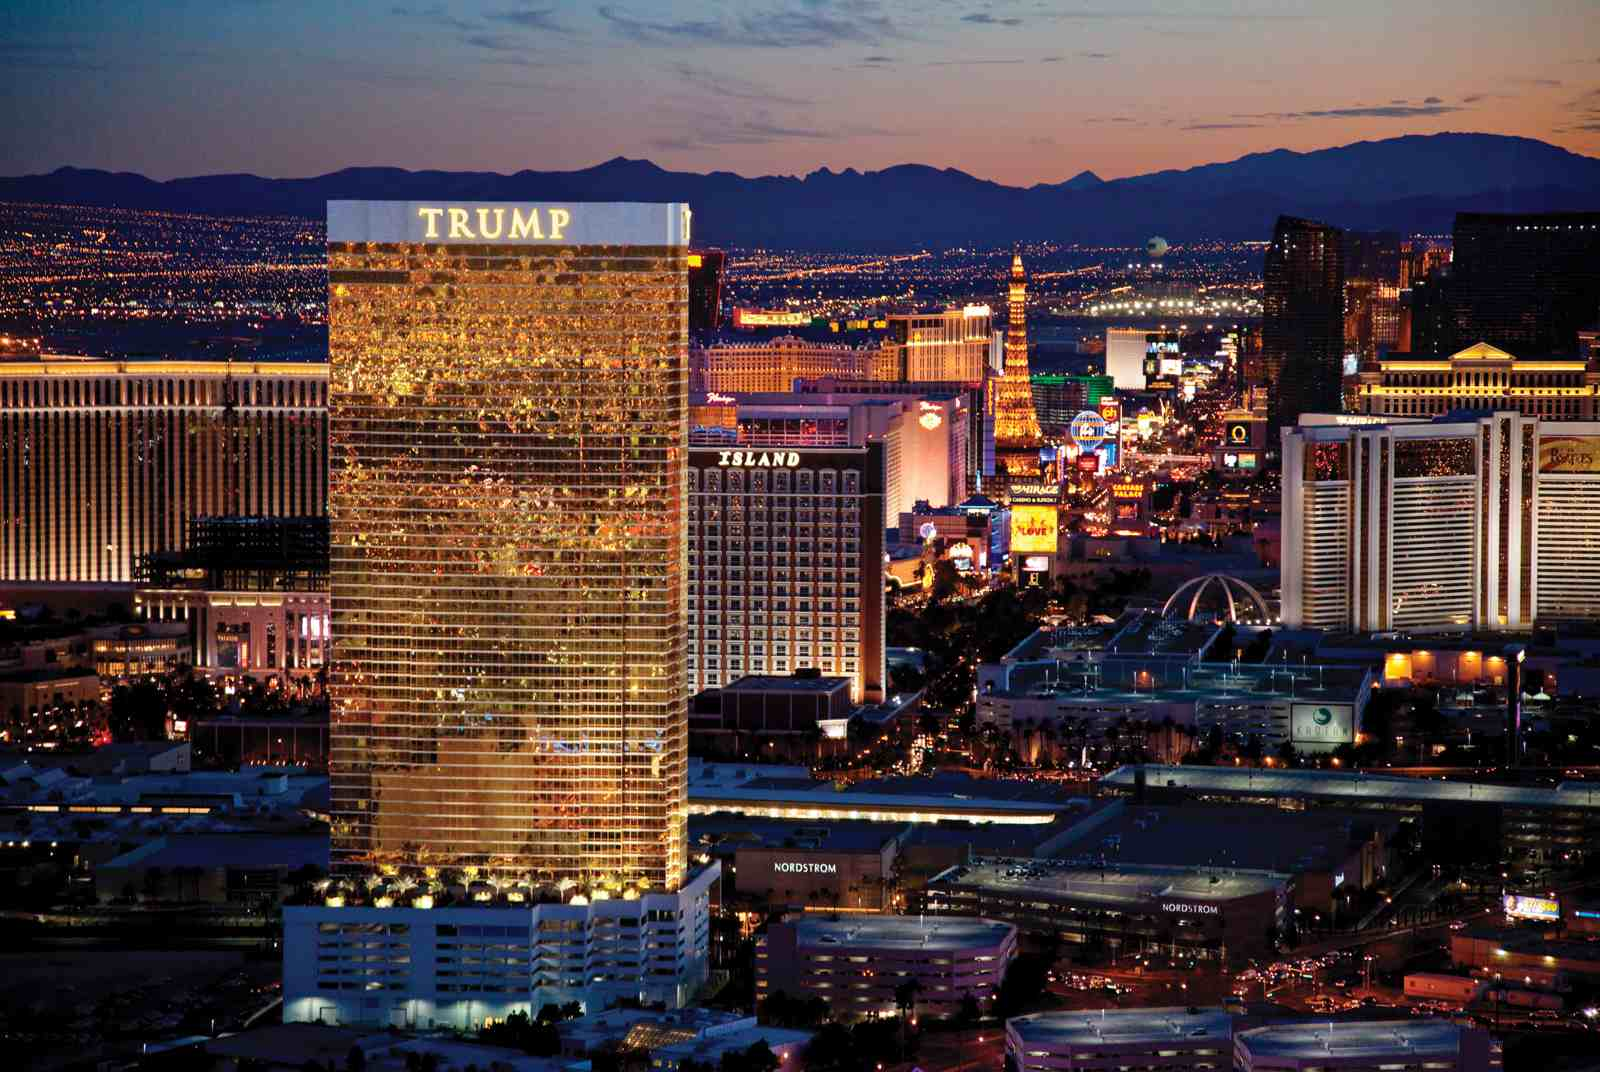 Trump Las Vegas hotel on the Strip